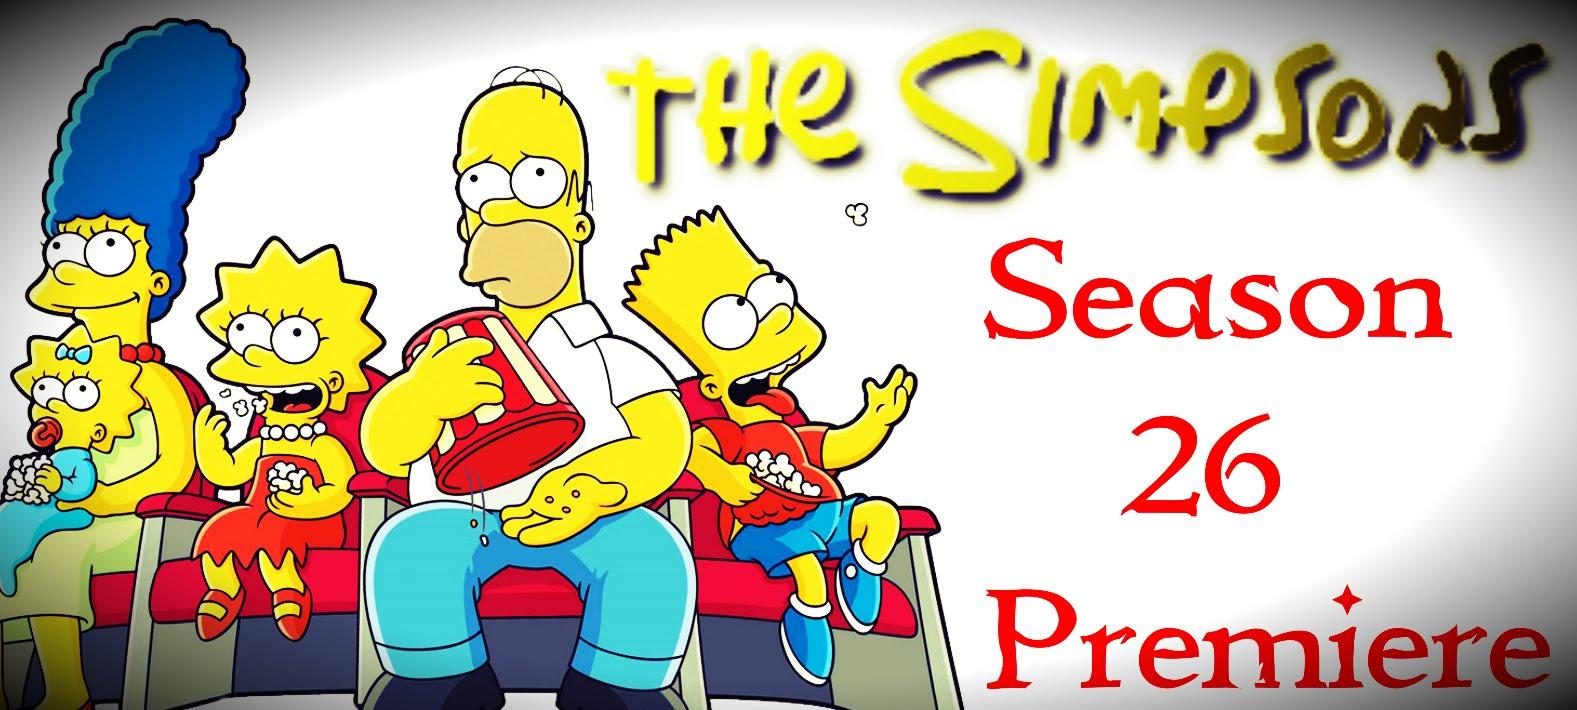 The Simpsons: Season 26